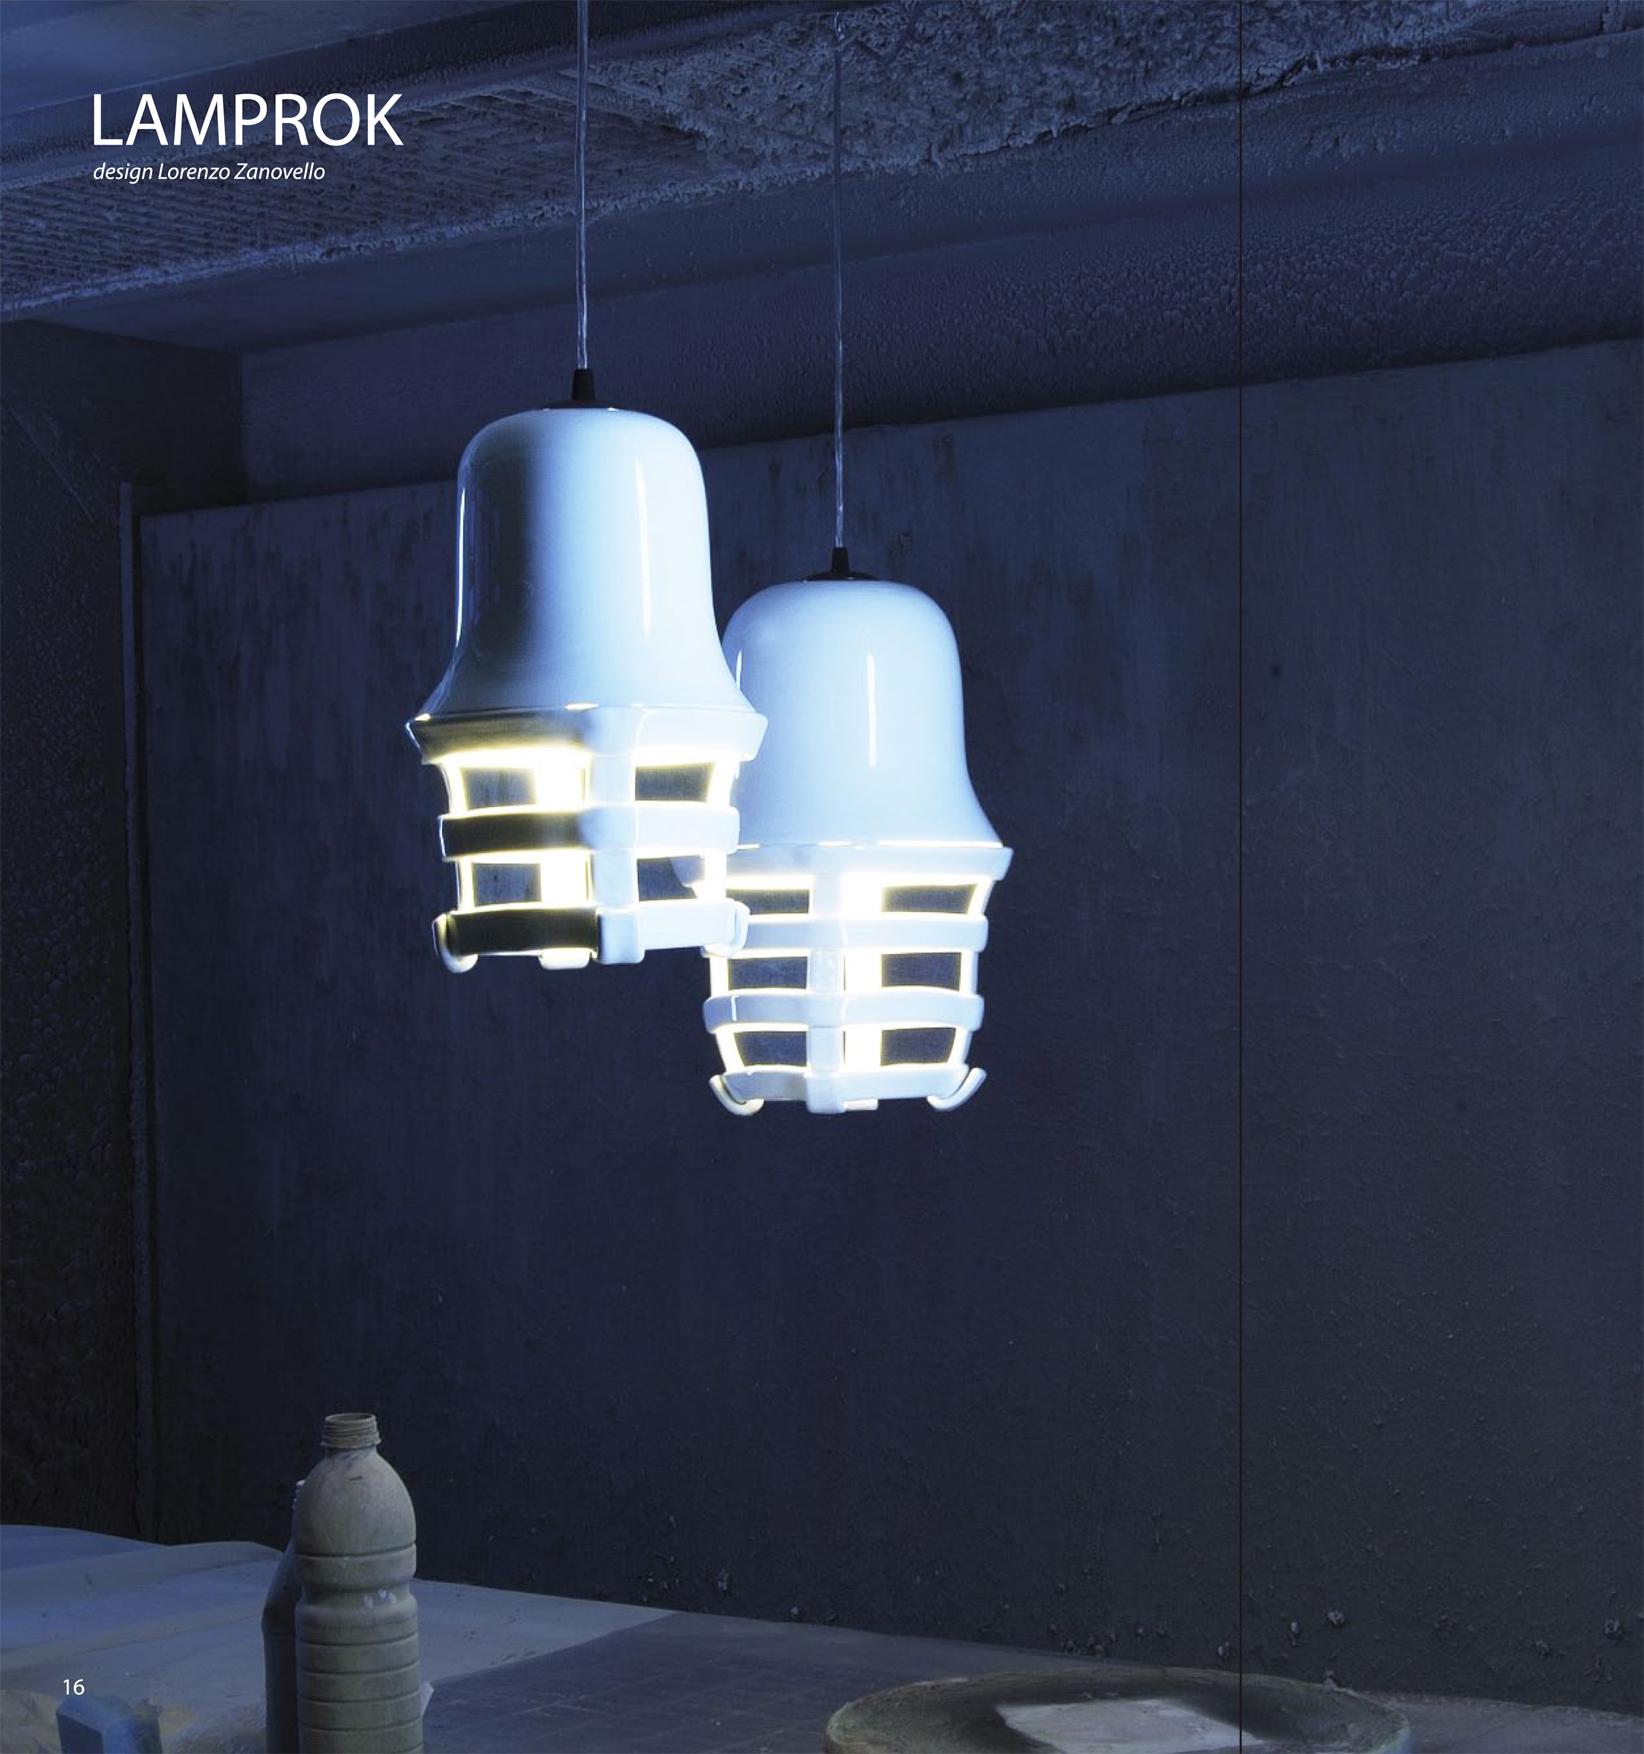 LAMPROK